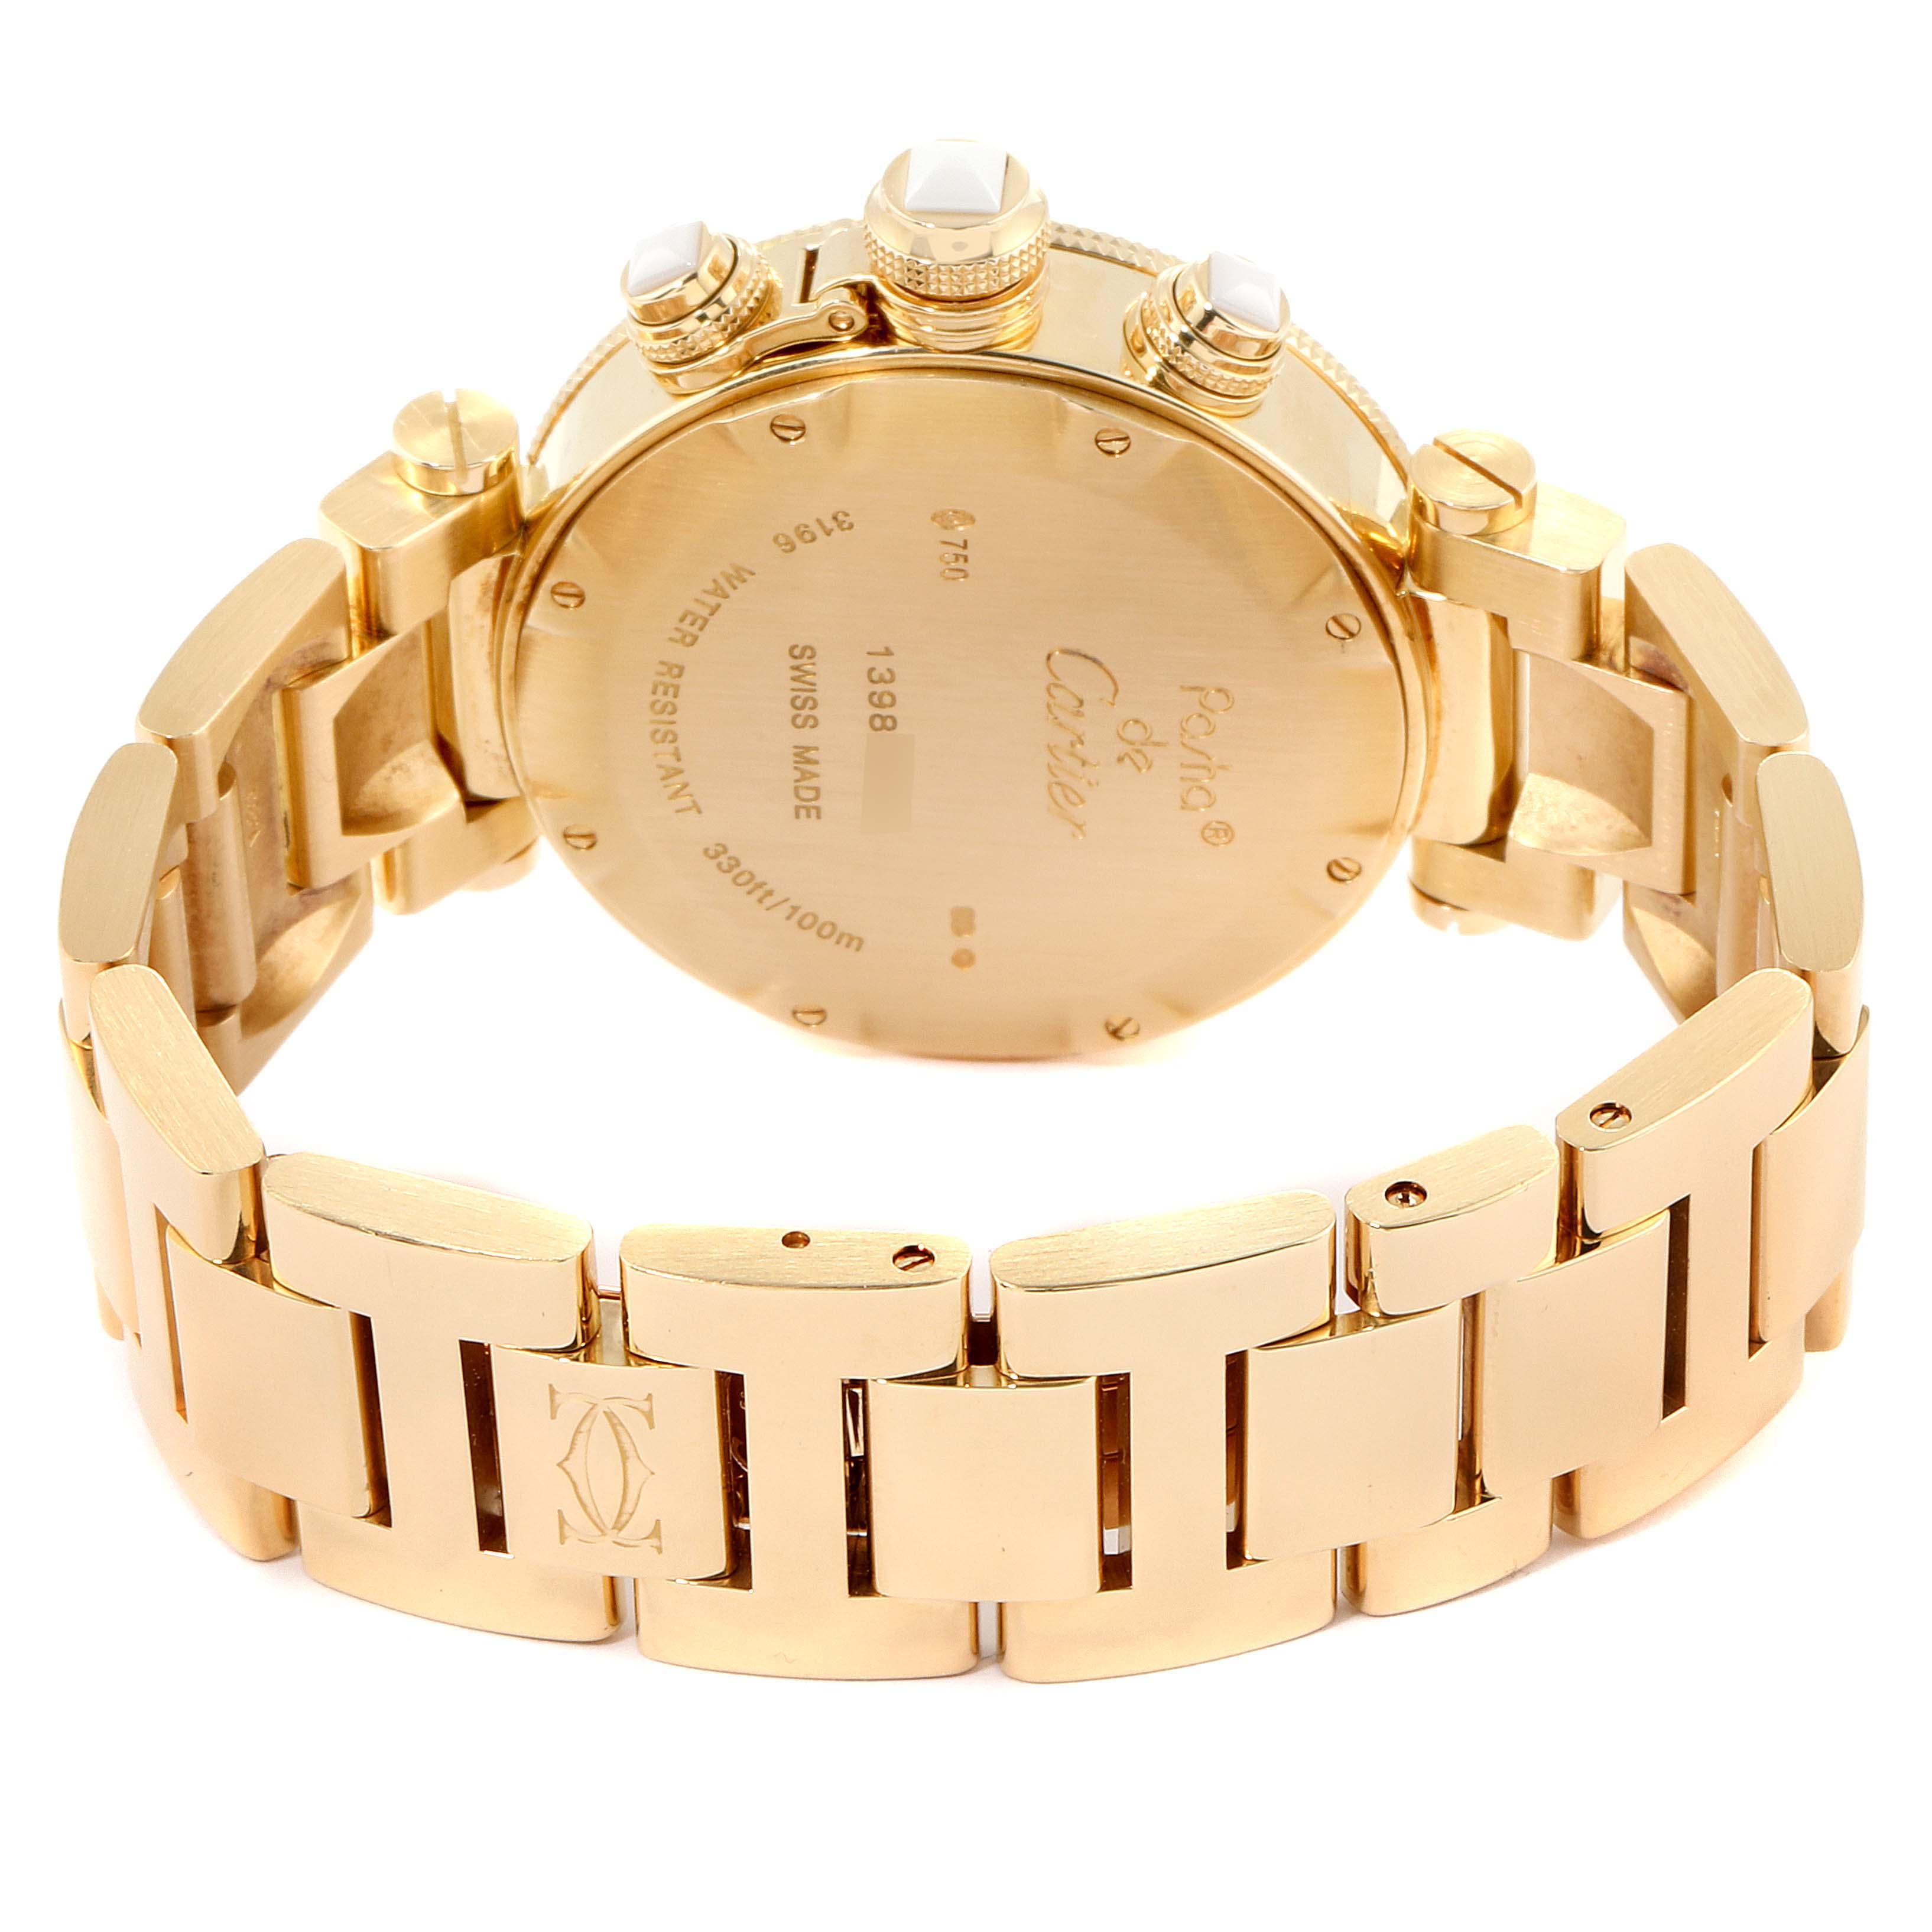 Cartier Pasha Seatimer Chronograph Yellow Gold Diamond Watch WJ130007 SwissWatchExpo